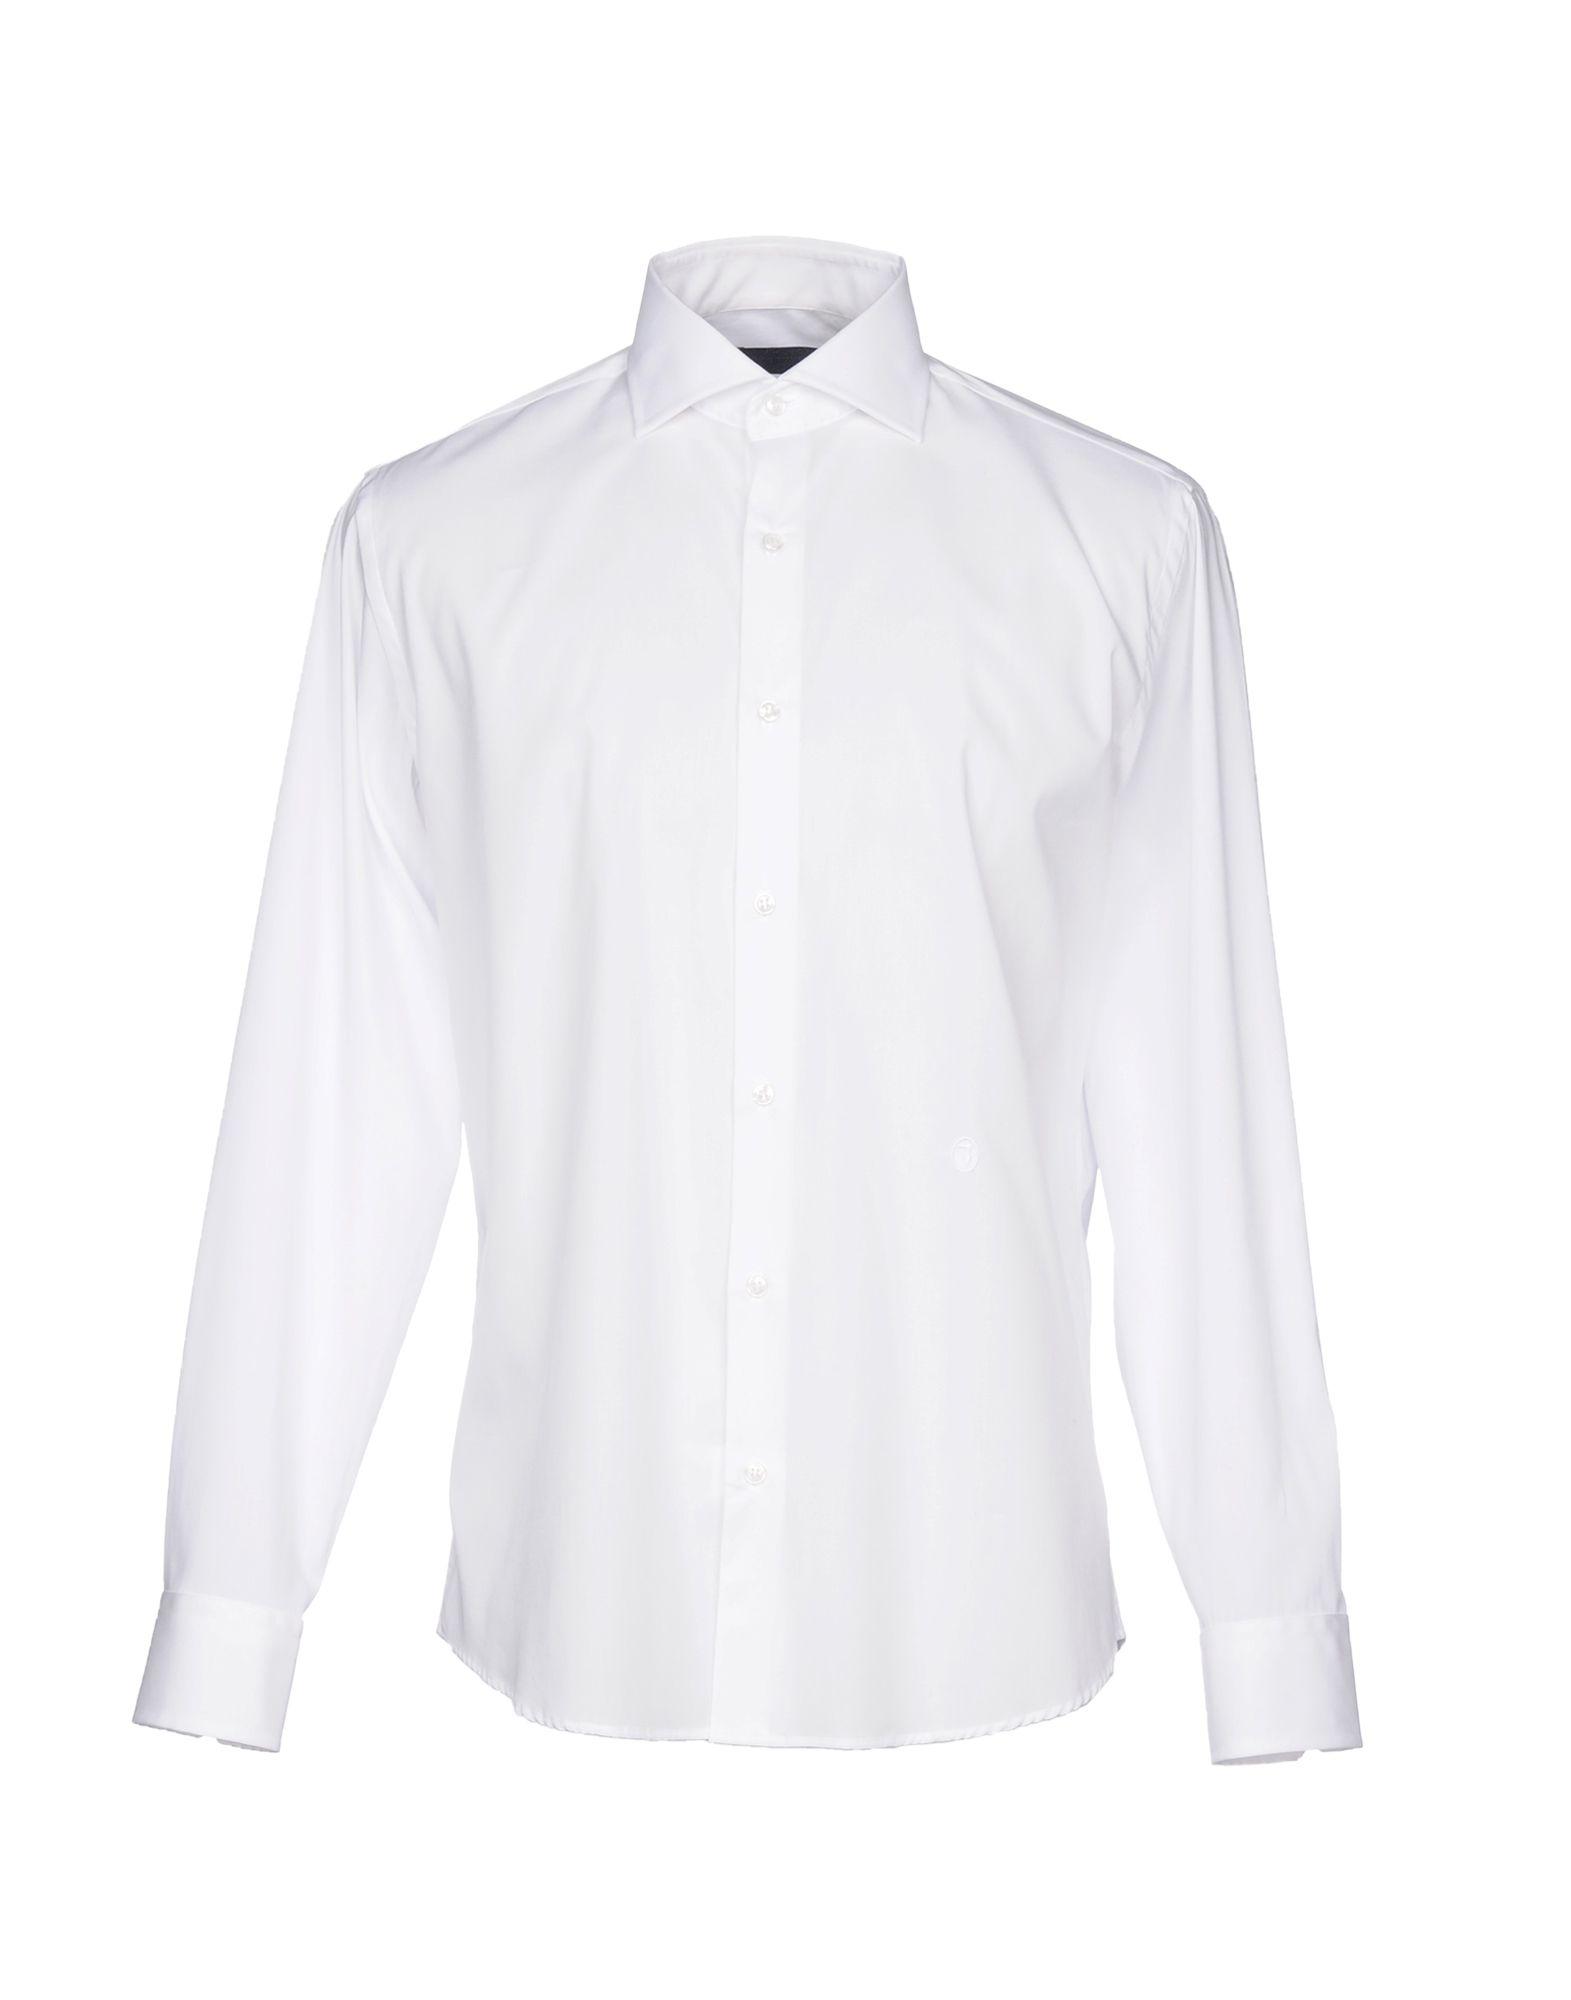 TRU TRUSSARDI Solid Color Shirt in White